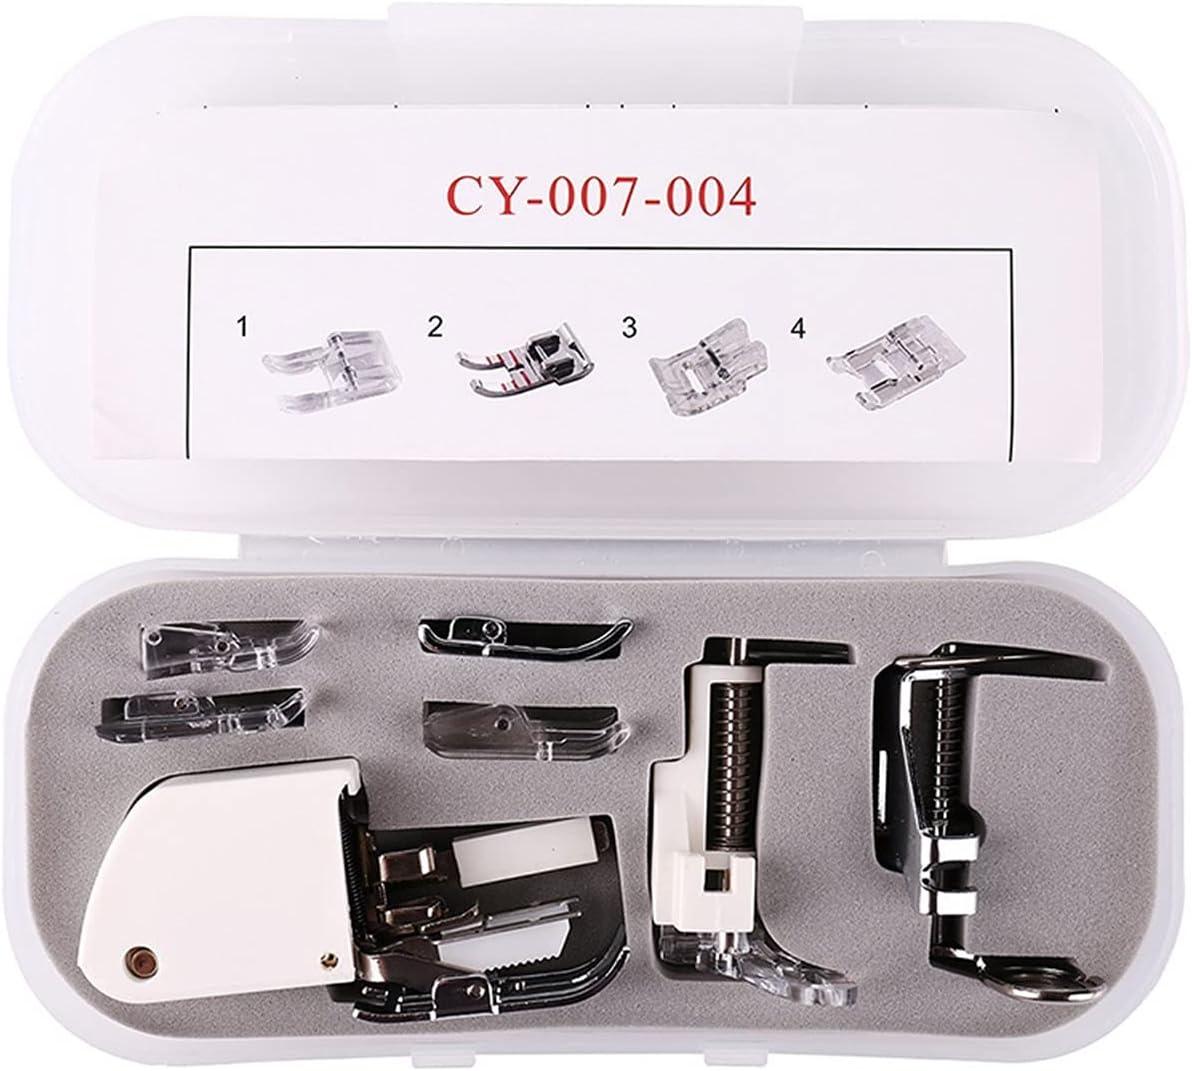 JSJJAUJ Sewing Machines Tools Parts P unisex Machine Outlet SALE Accessories